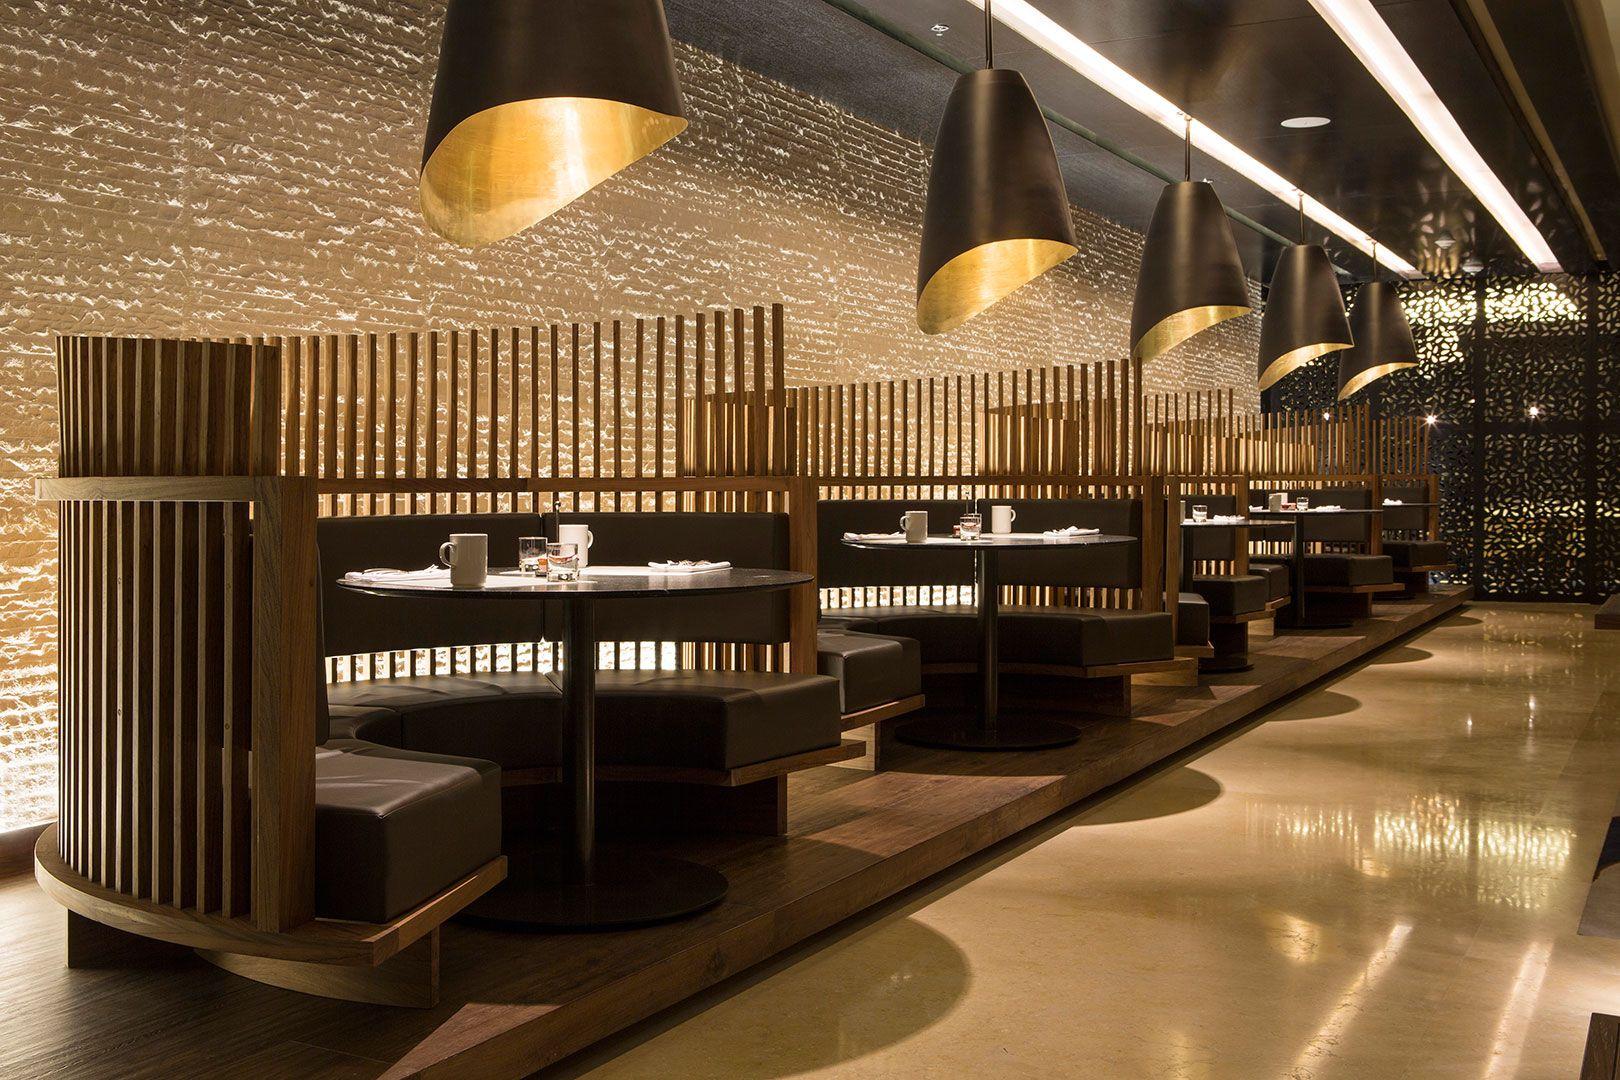 Tampilan Unik dengan Partisi Kayu, Desain Restoran Jepang Ini Bisa Kalian Tiru